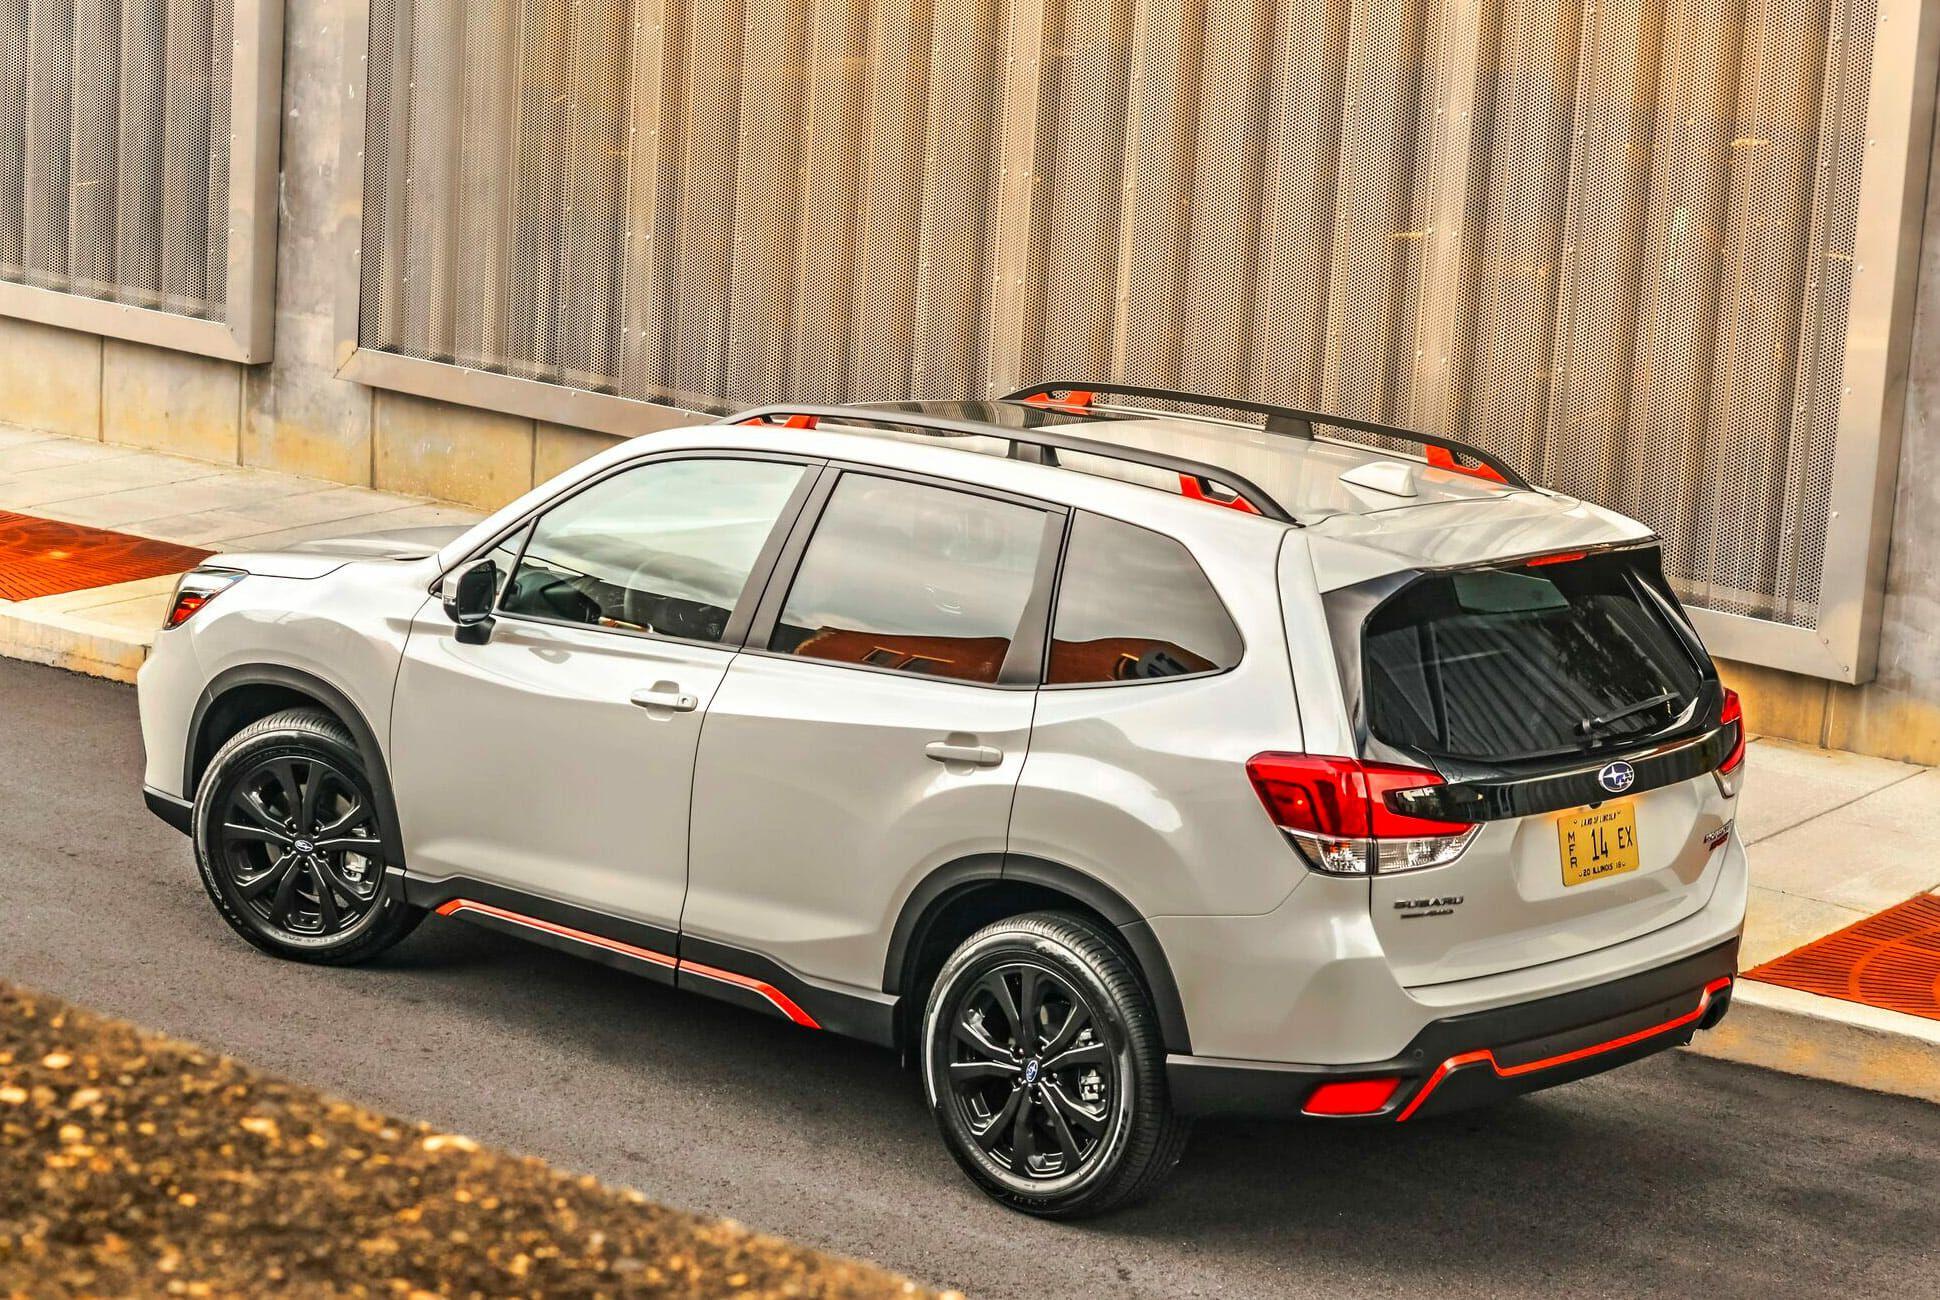 2019-Subaru-Forester-Gear-Patrol-Slide-2